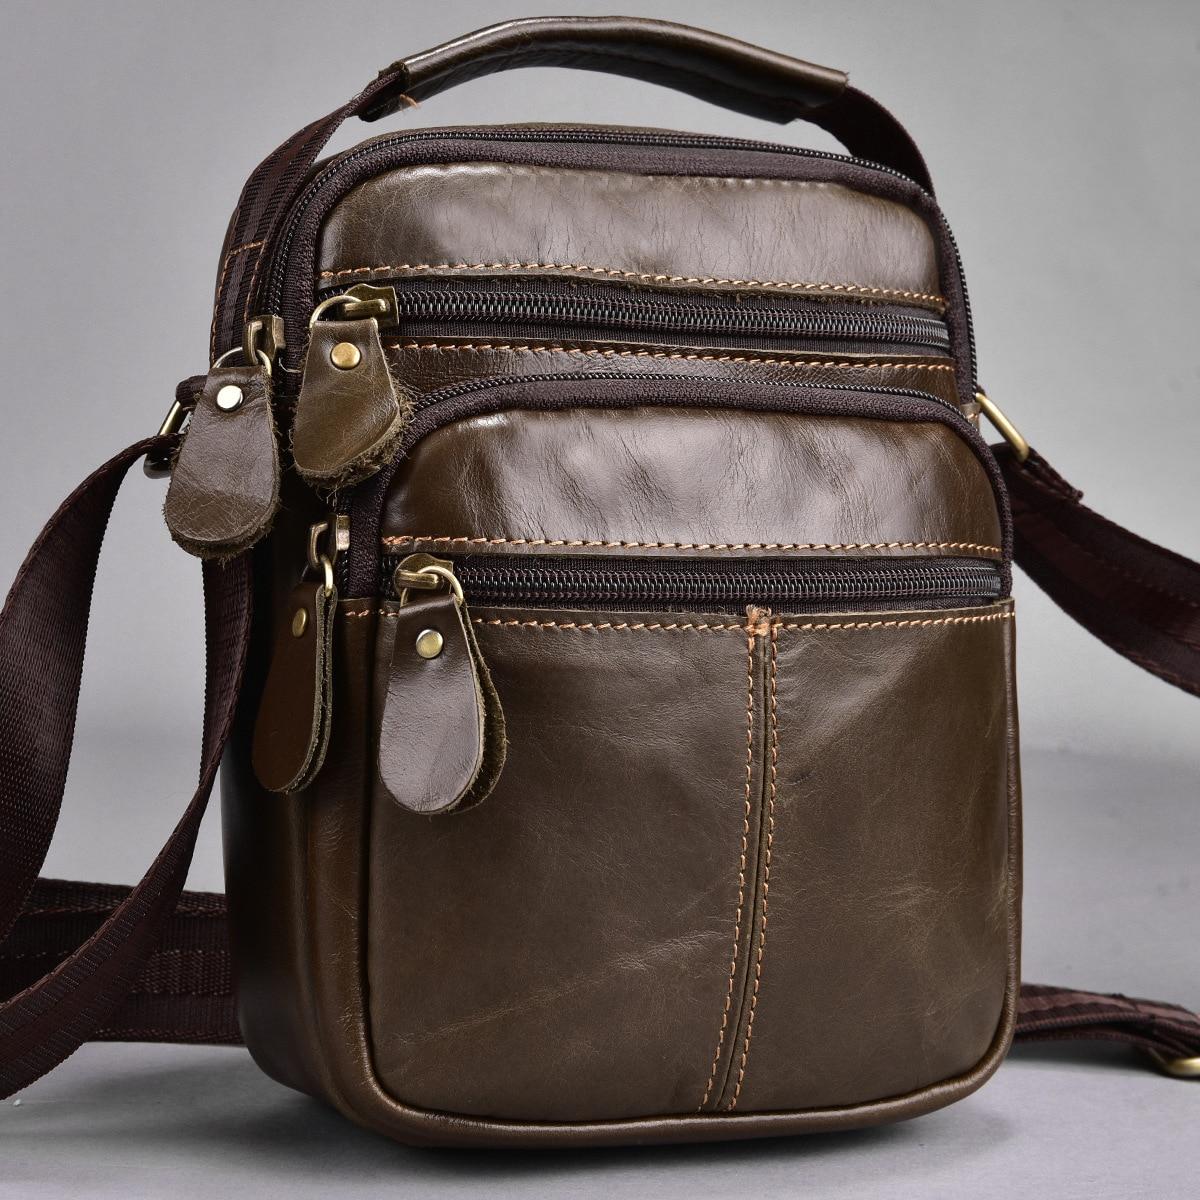 Shoulder-Bag Business Men's Multi-Function Boutique